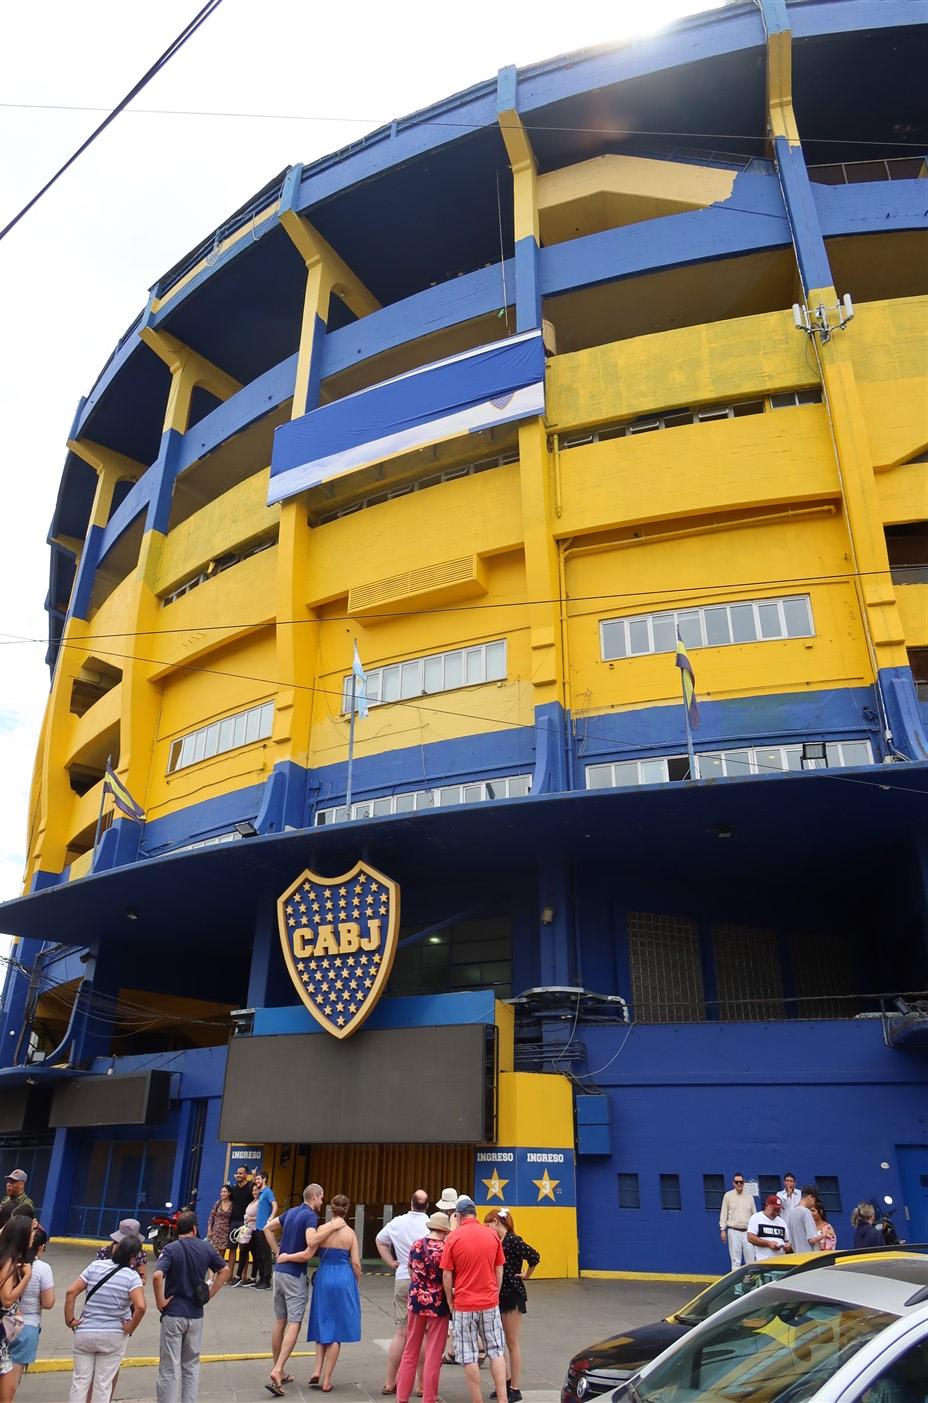 2020 03 08 121 Buenos Aires Boca Juniors Soccer Team.jpg